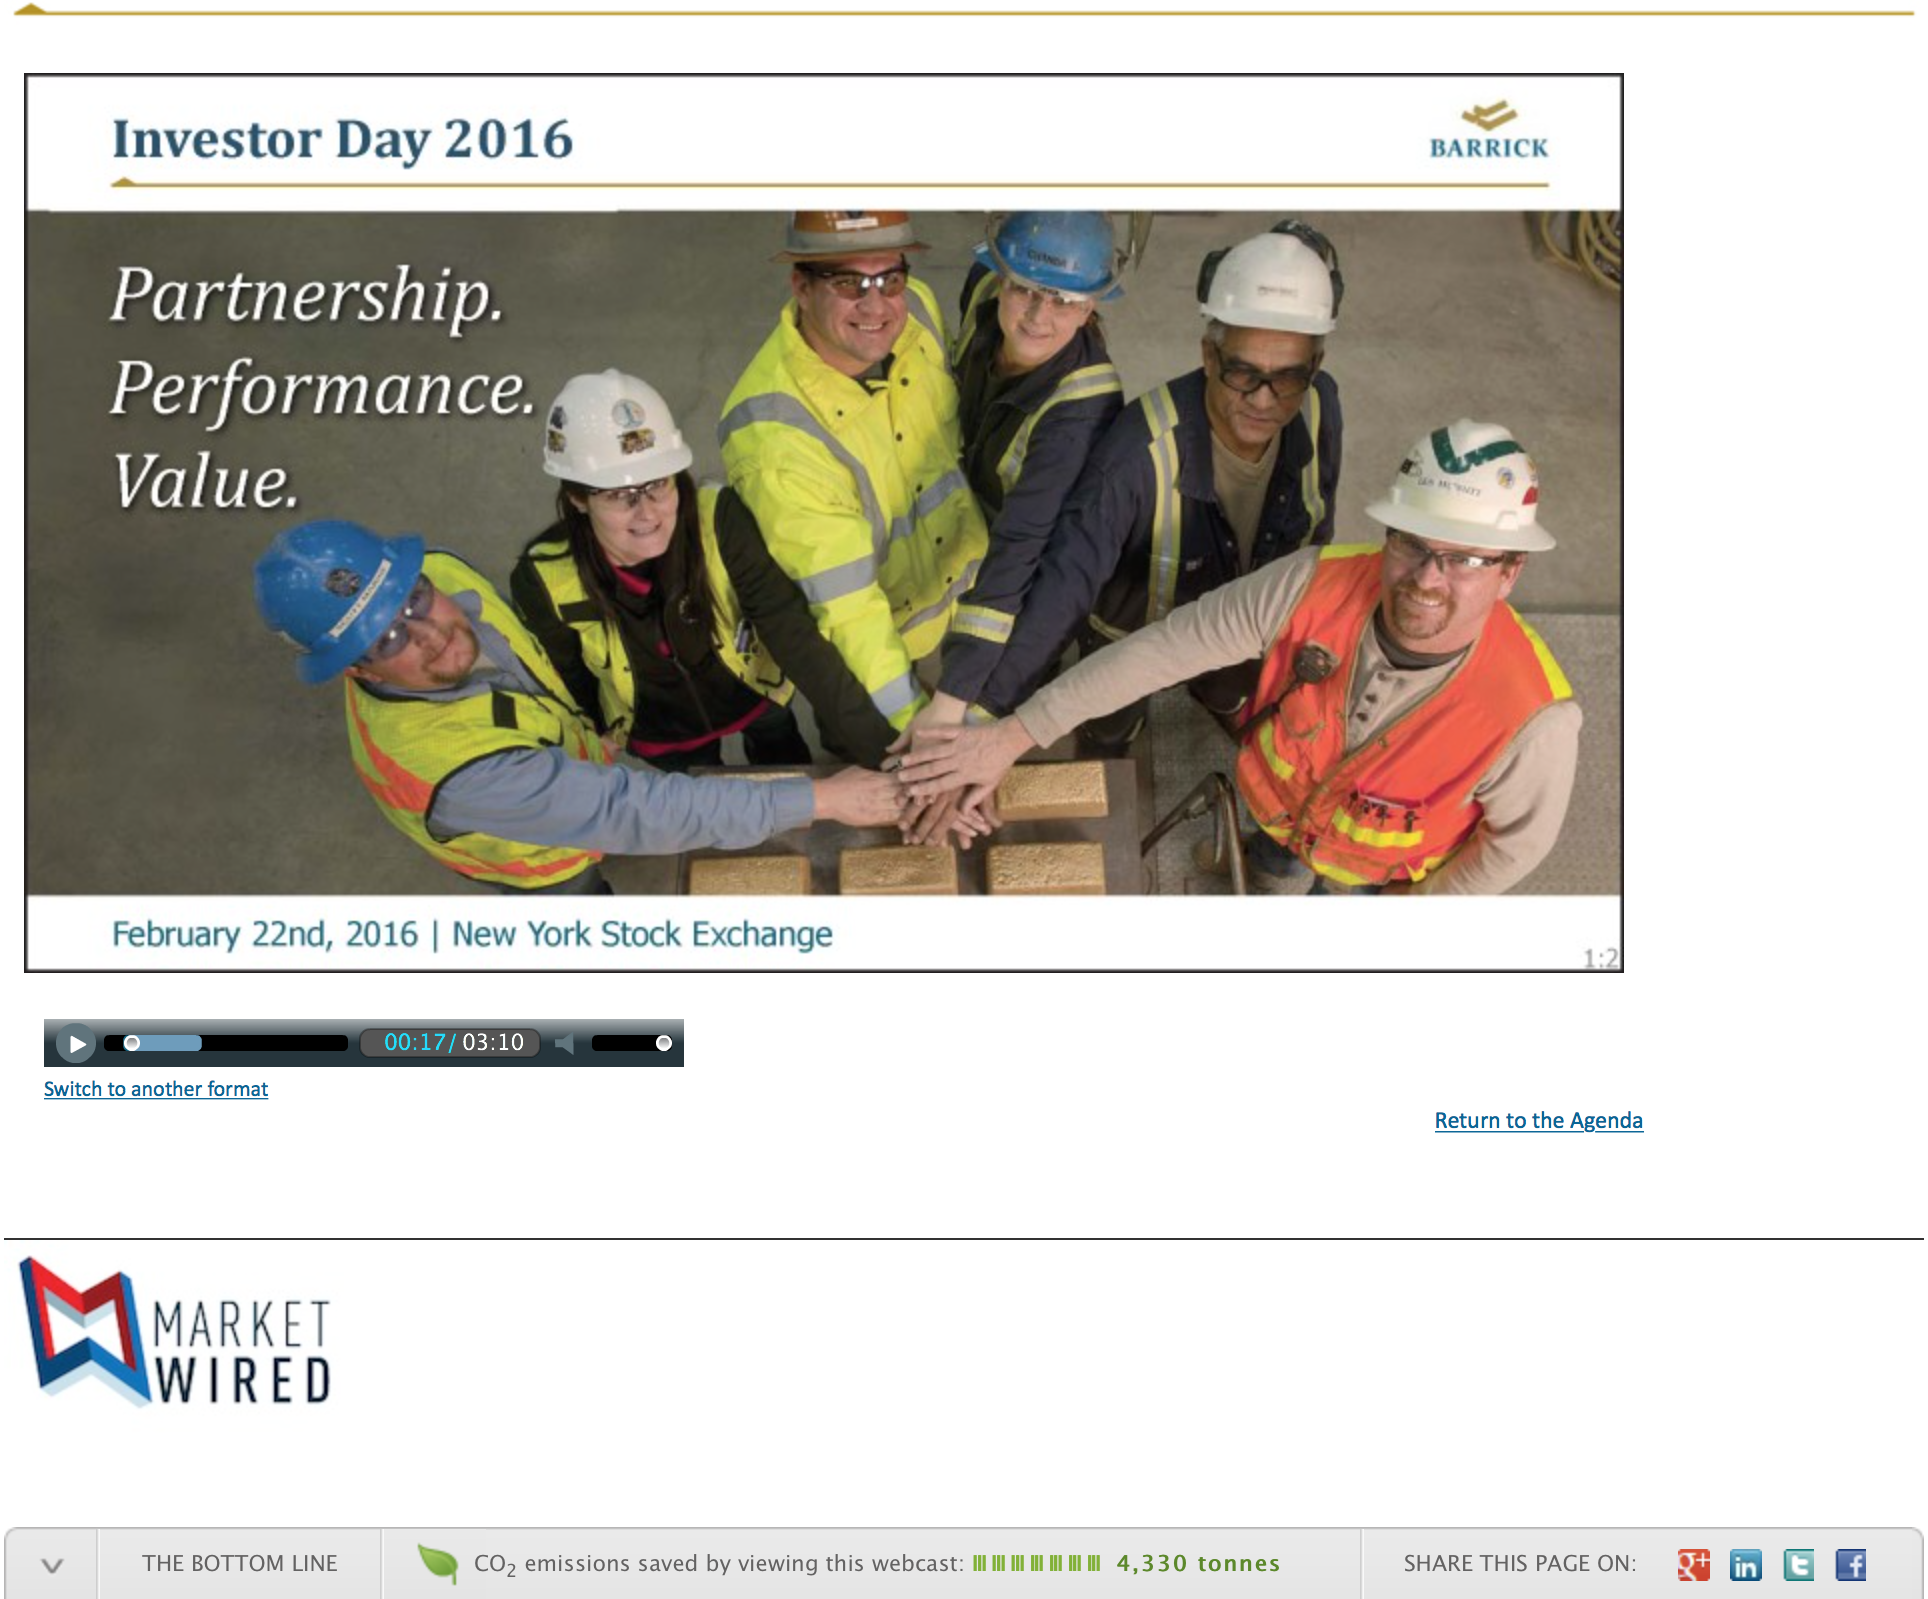 Barrick Investor Day